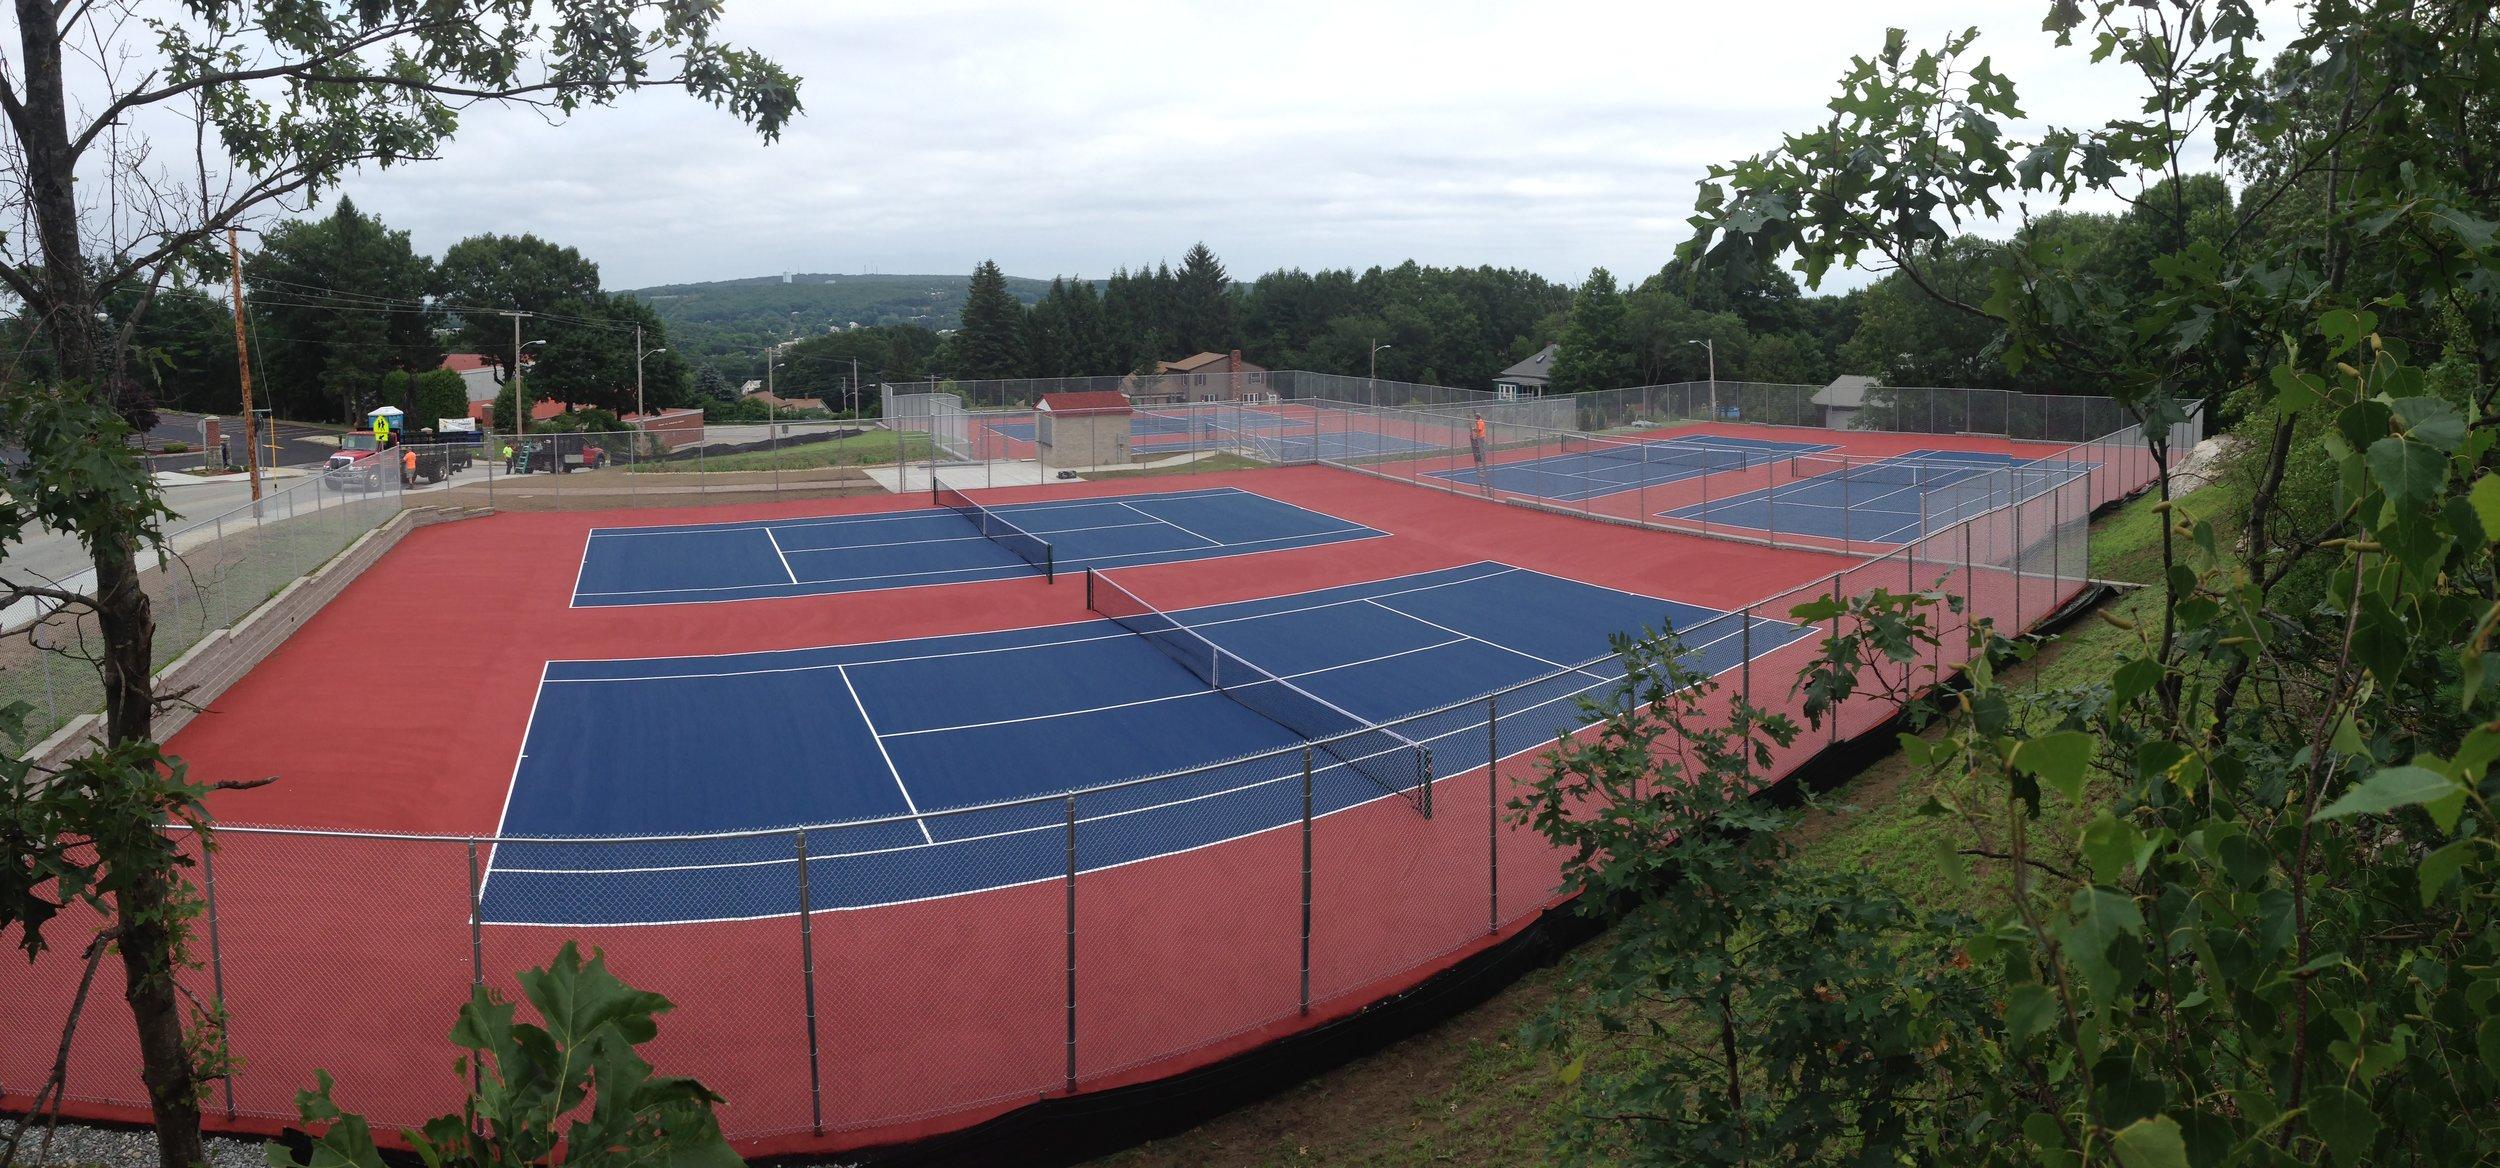 Mount Saint Charles Academy Tennis Complex - Woonsocket.JPG